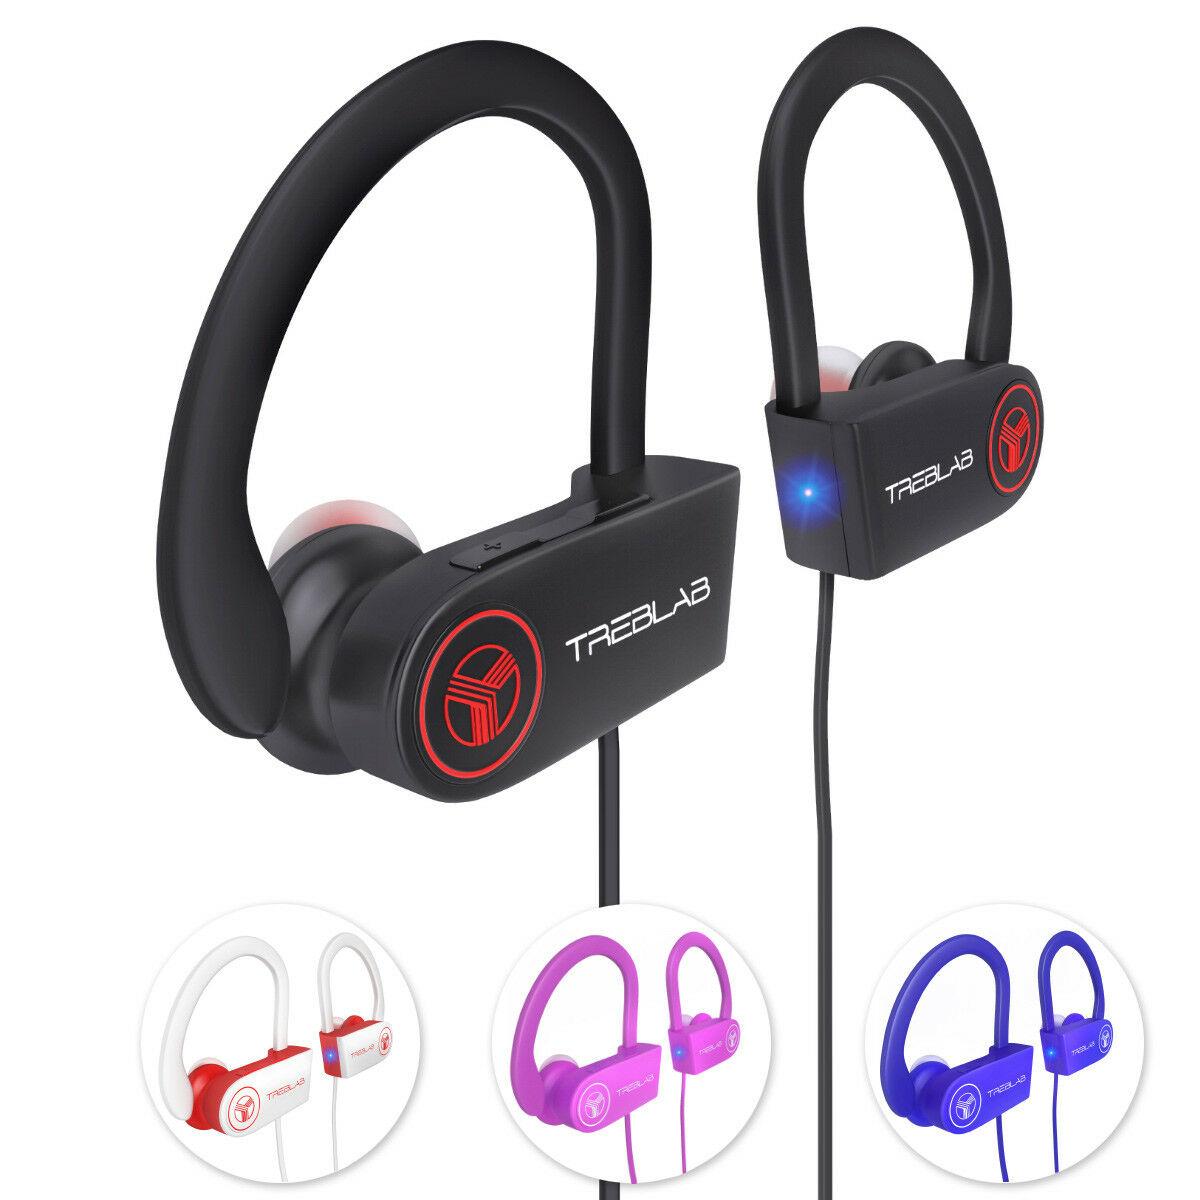 TREBLAB XR100 Sports Bluetooth Earbuds for $11.99 + Free Shipping w/PRIME